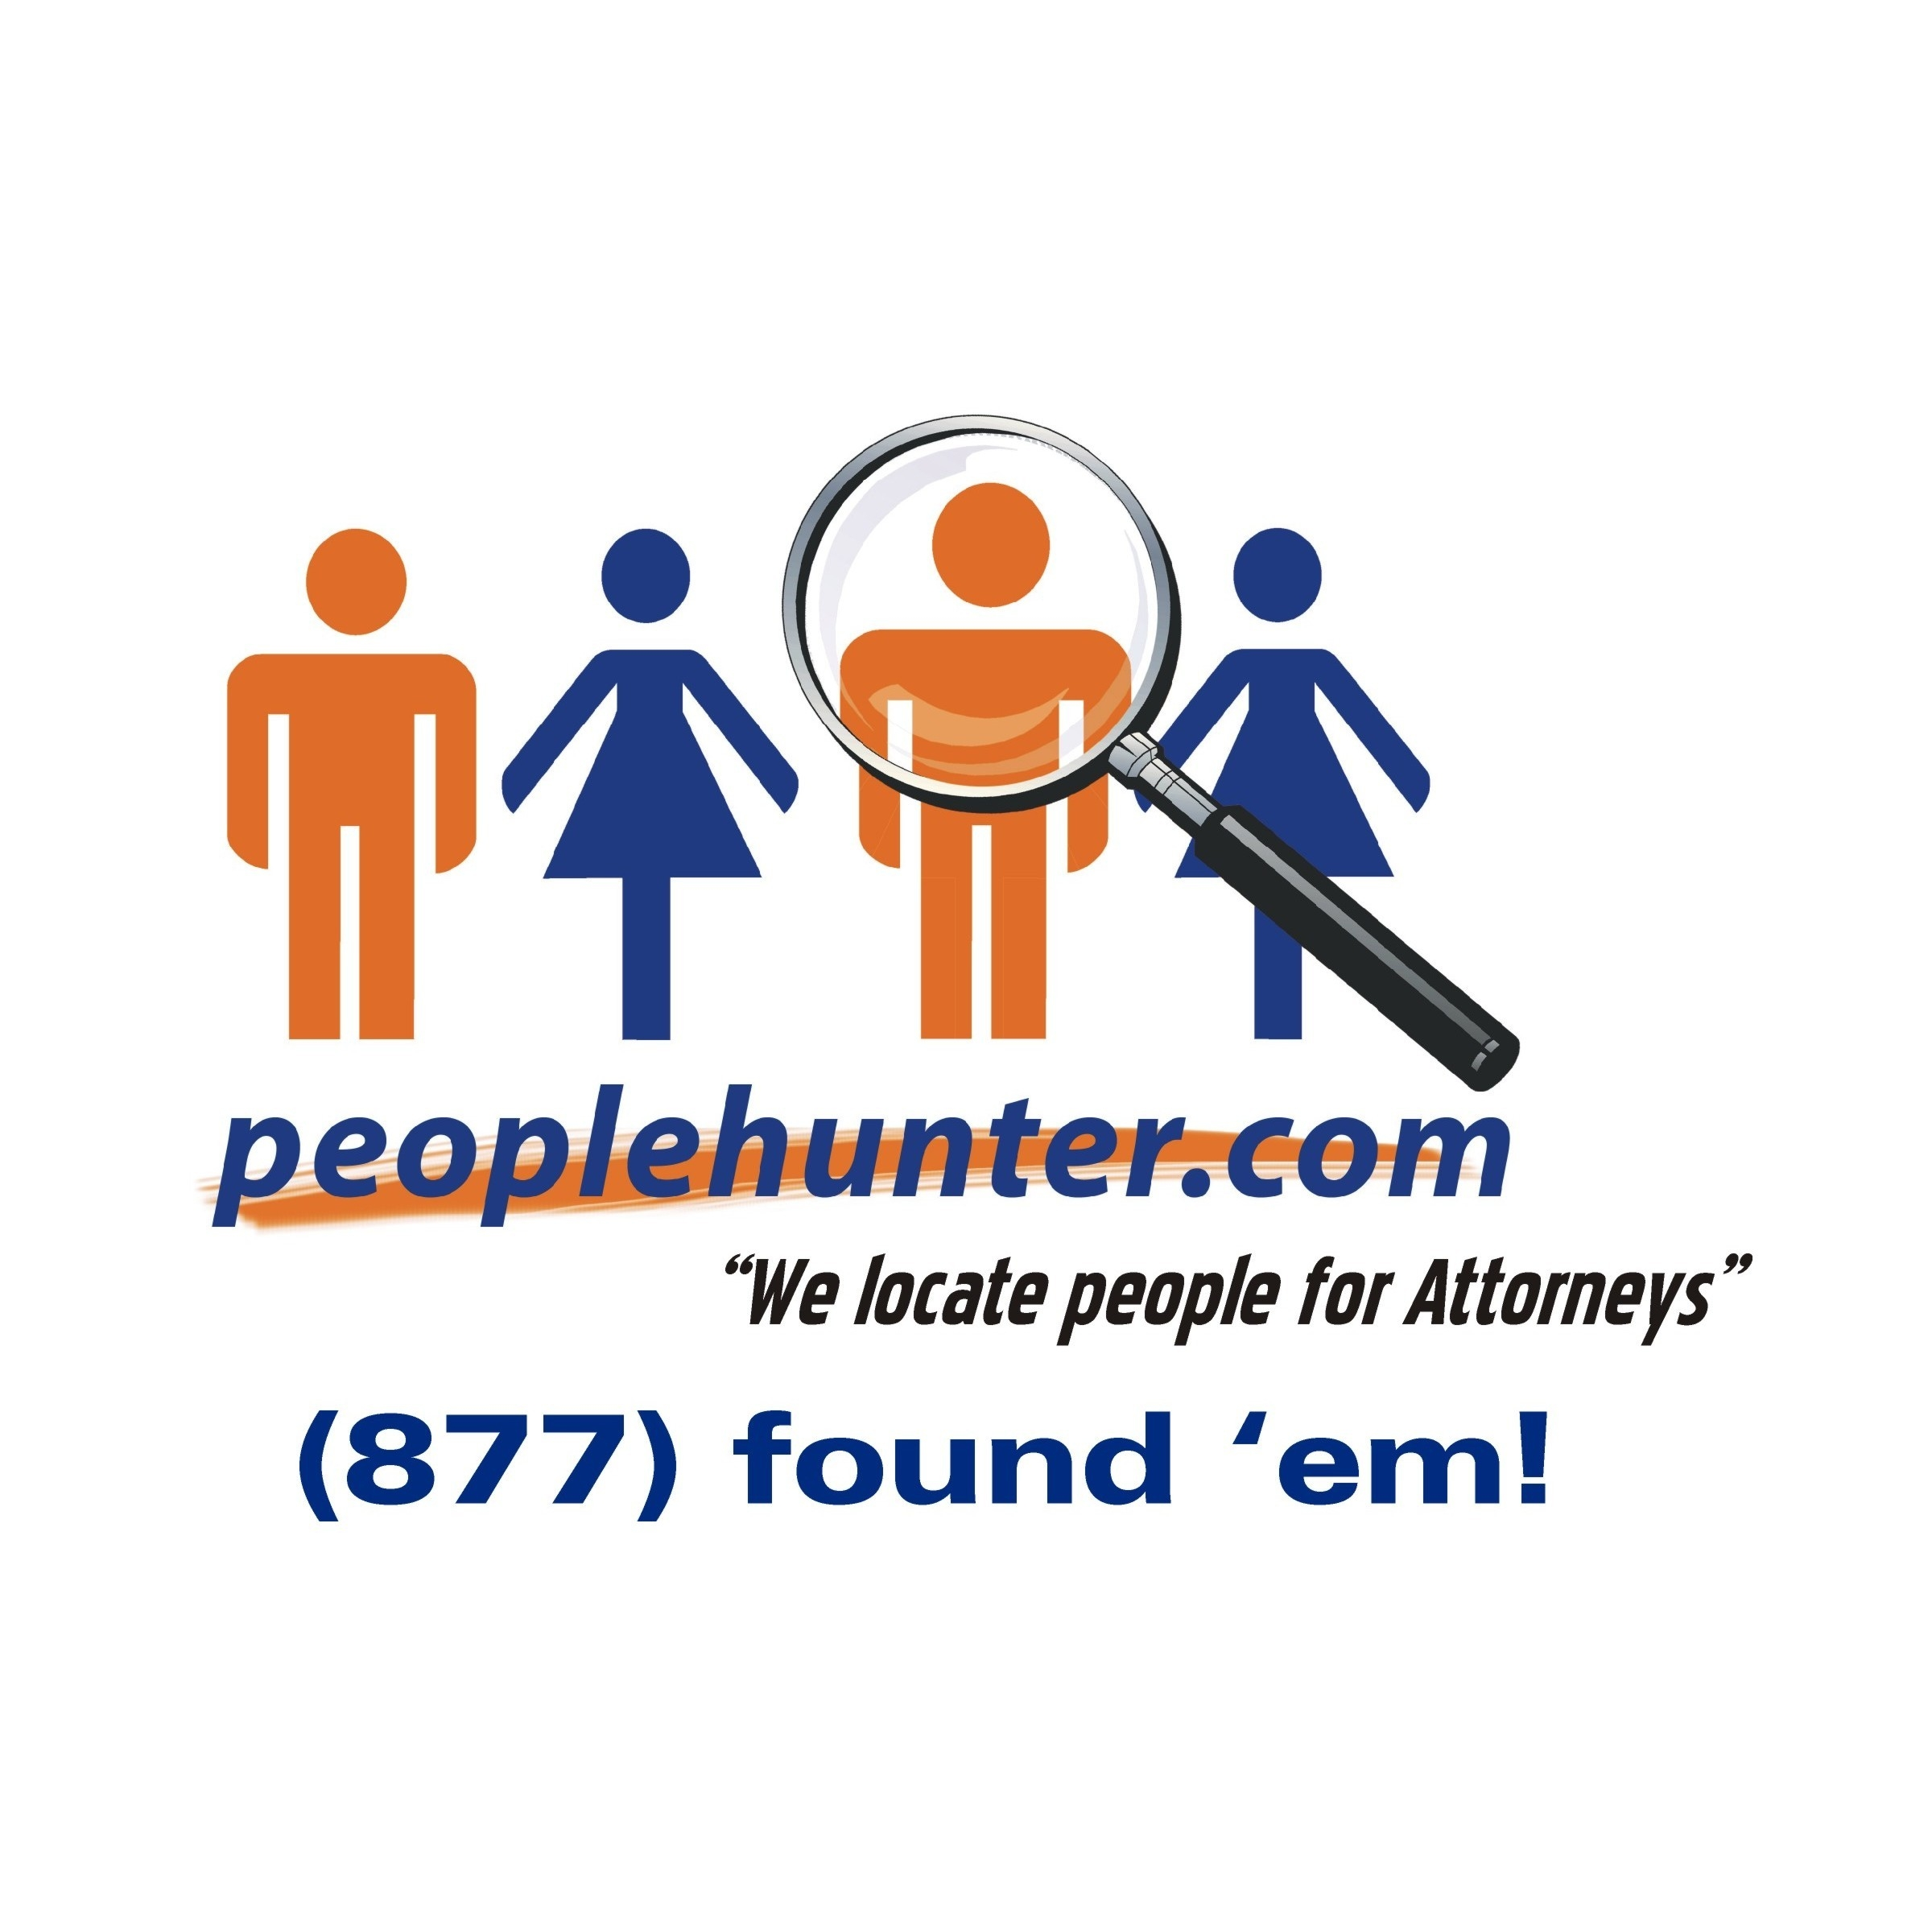 Peoplehunter.com